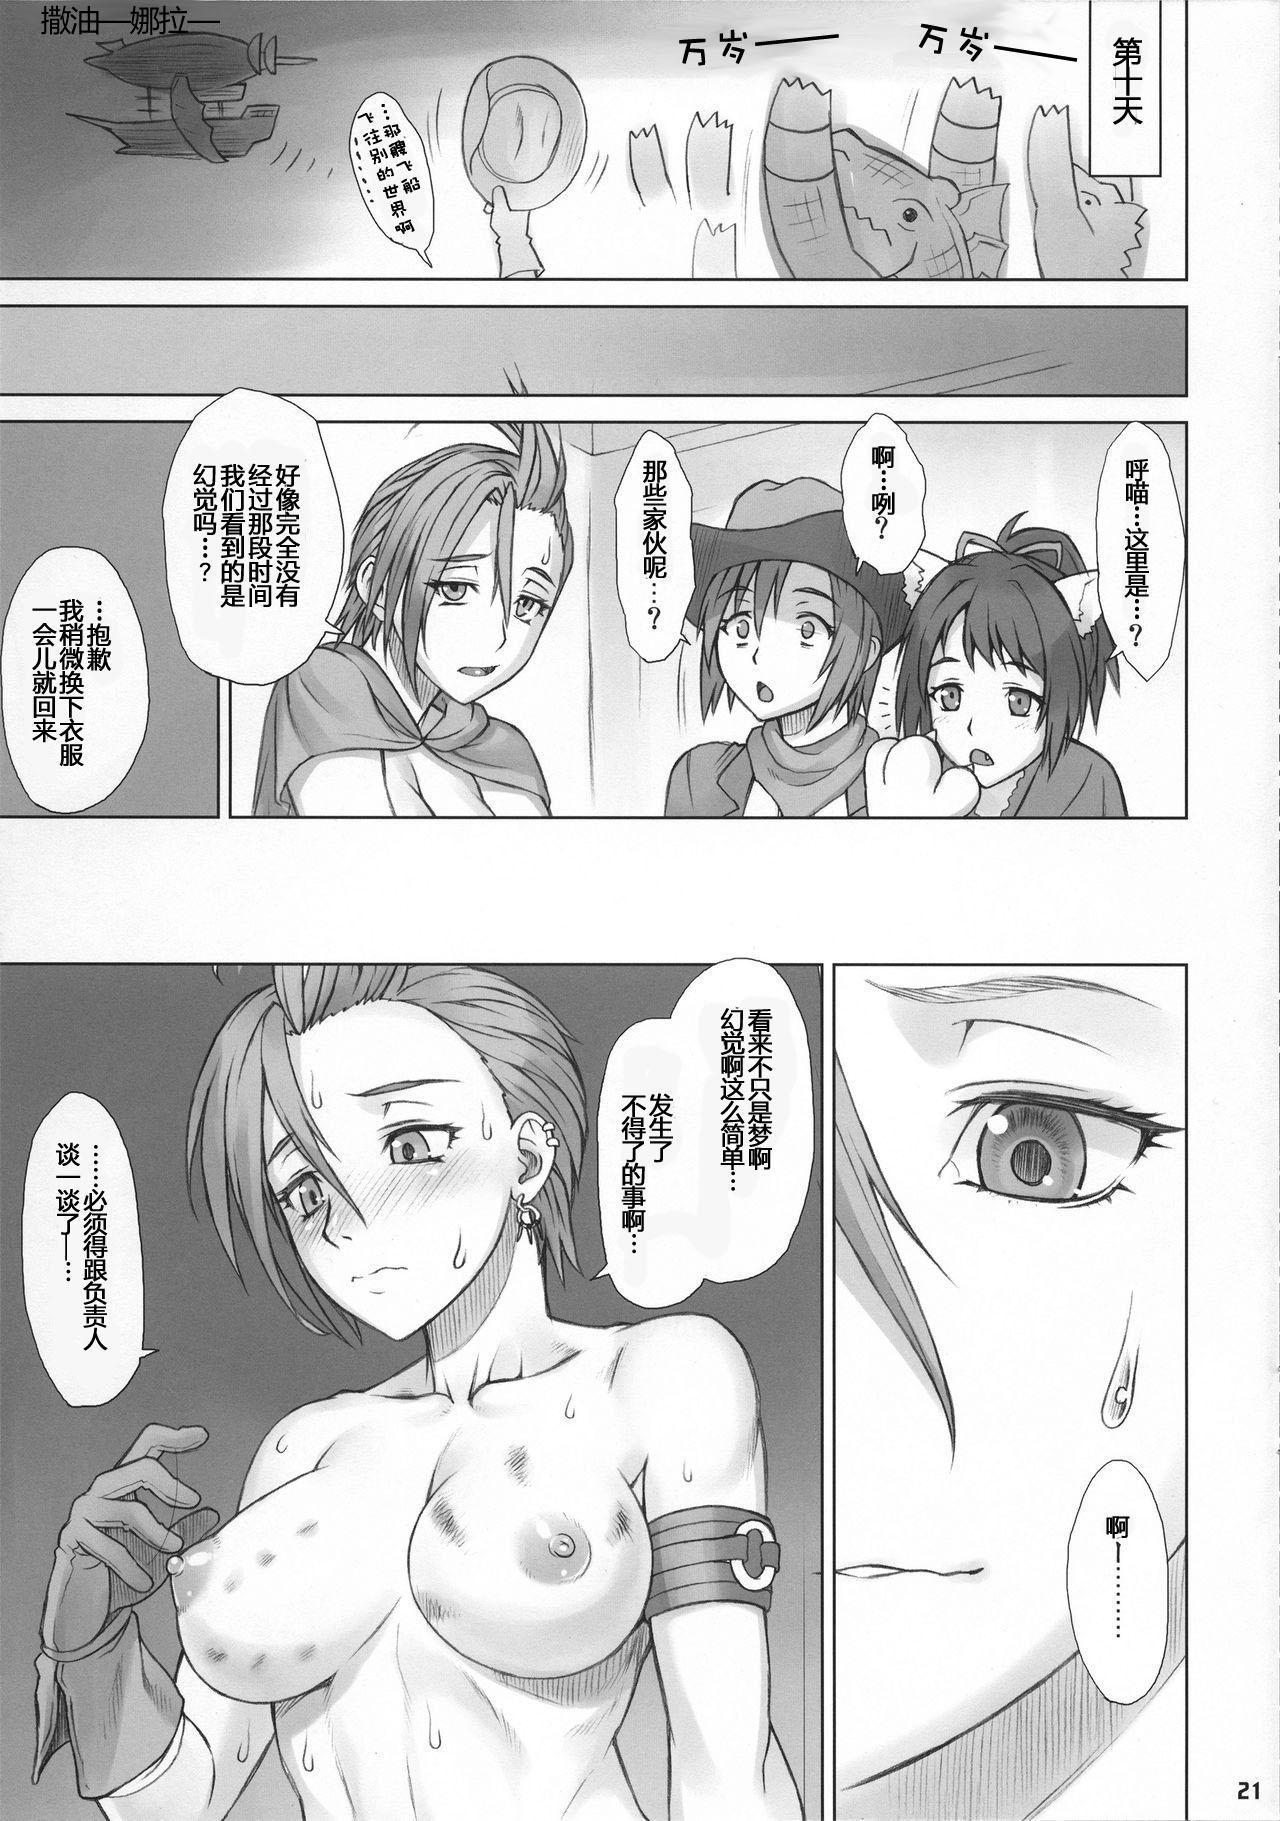 Isekai Natsukichi 19